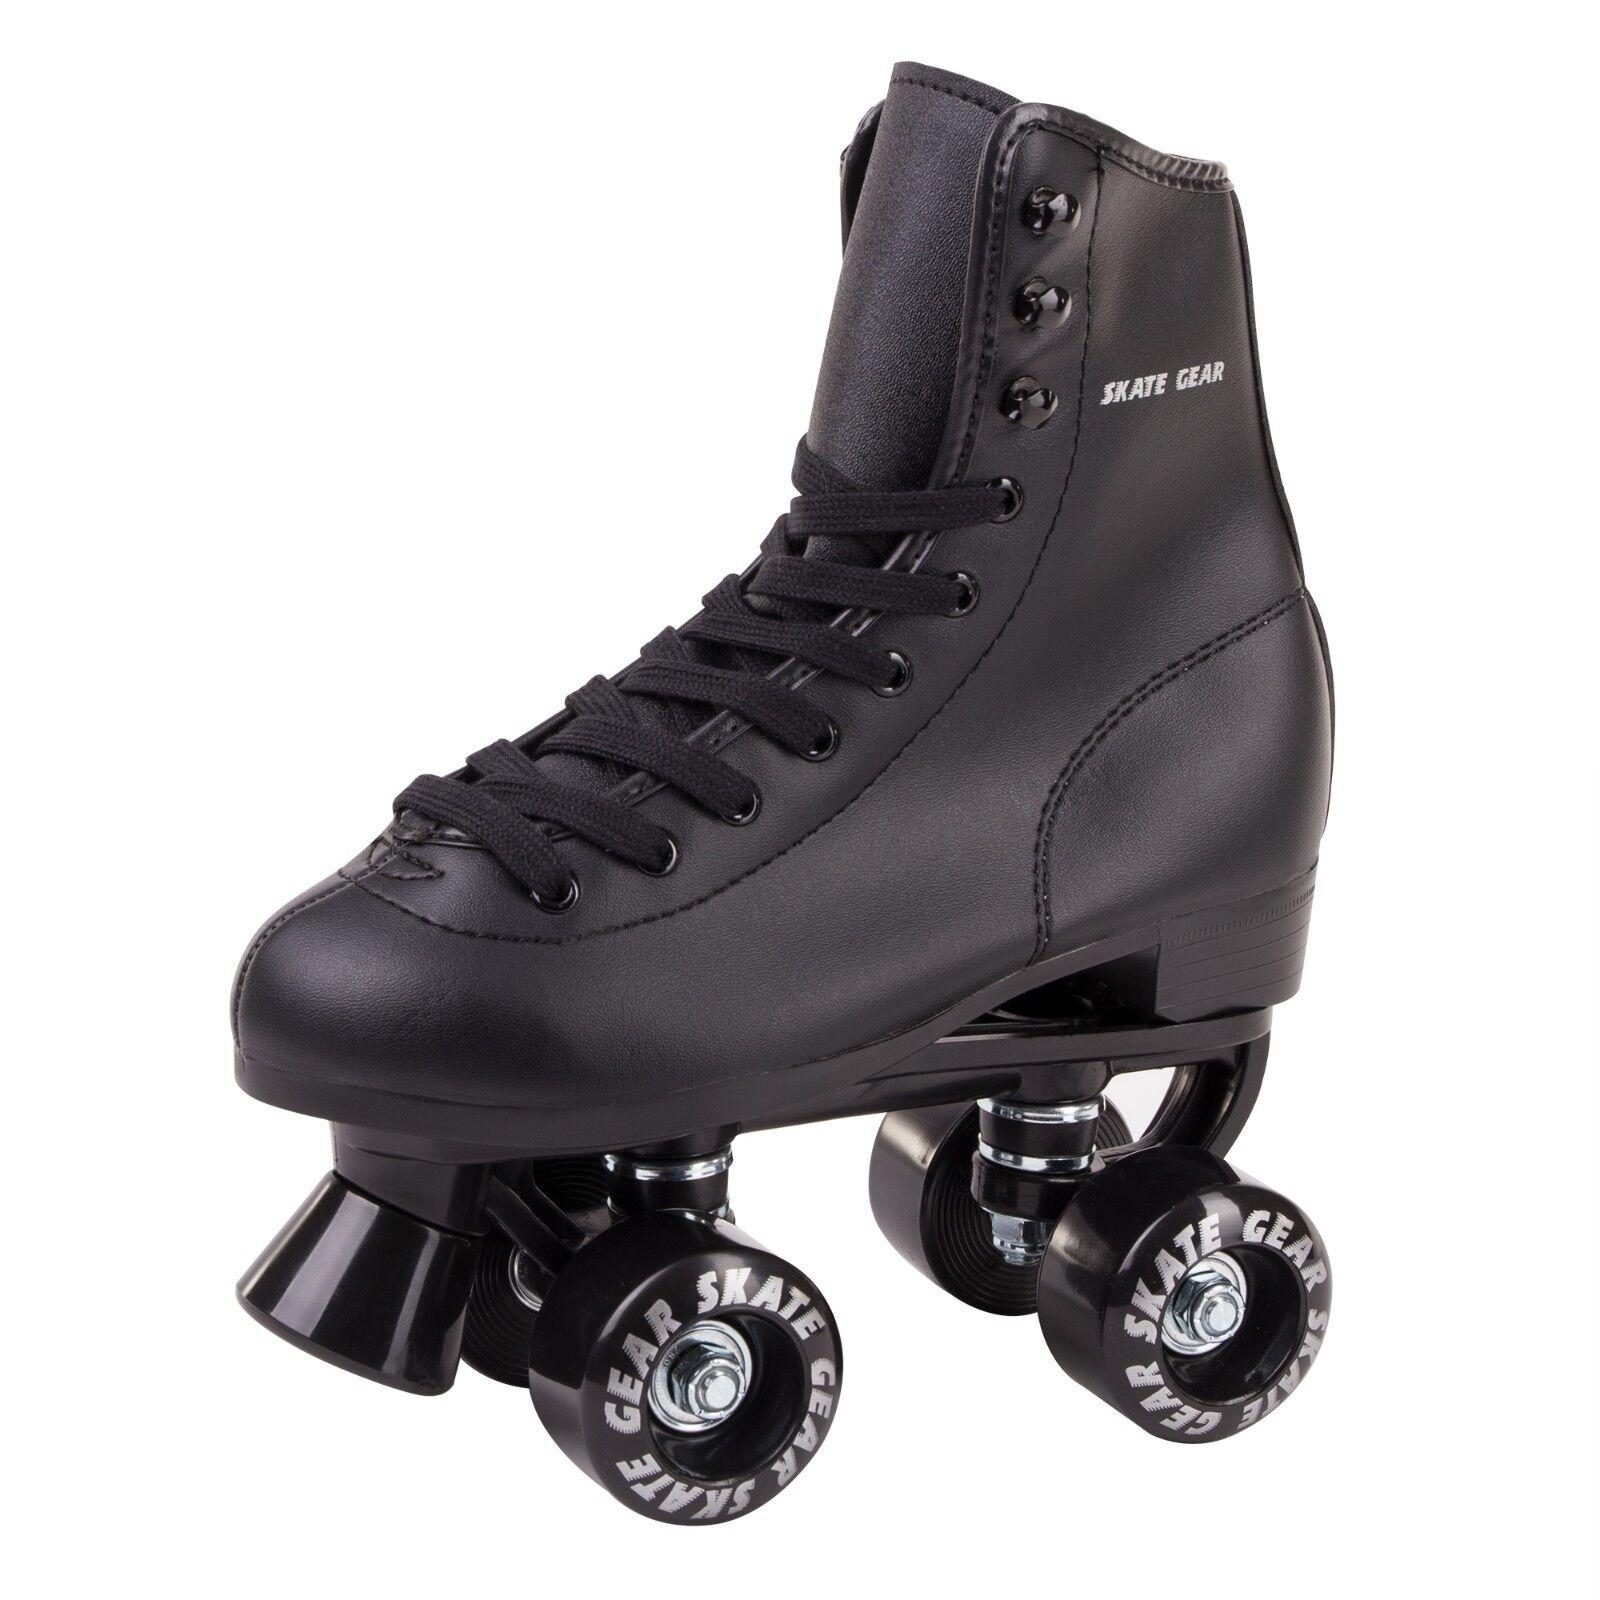 Skate Gear Soft Cute Roller Skates, Christmas and Holiday Gi